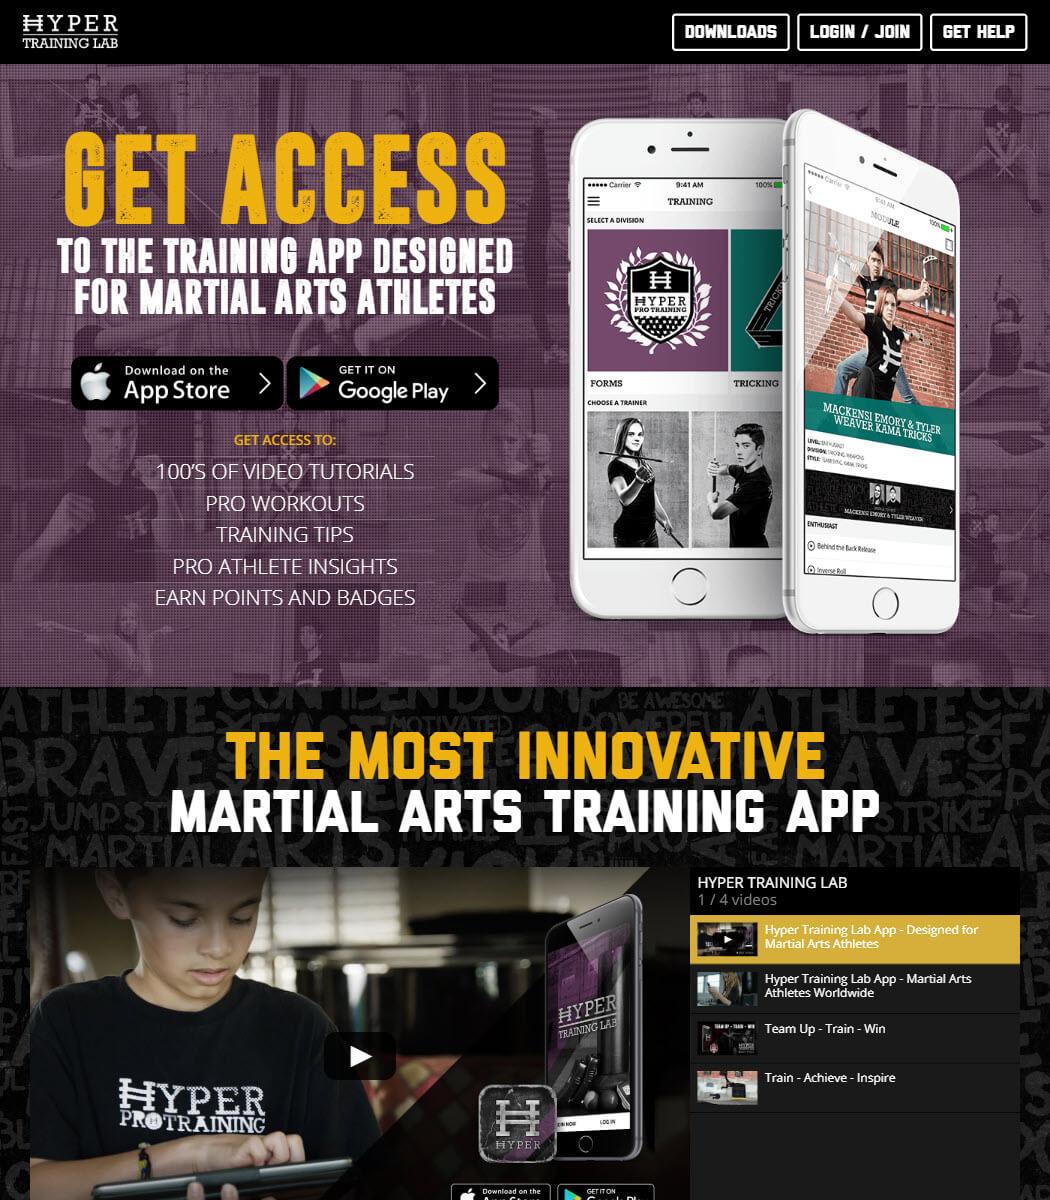 Hyper Training Lab Website